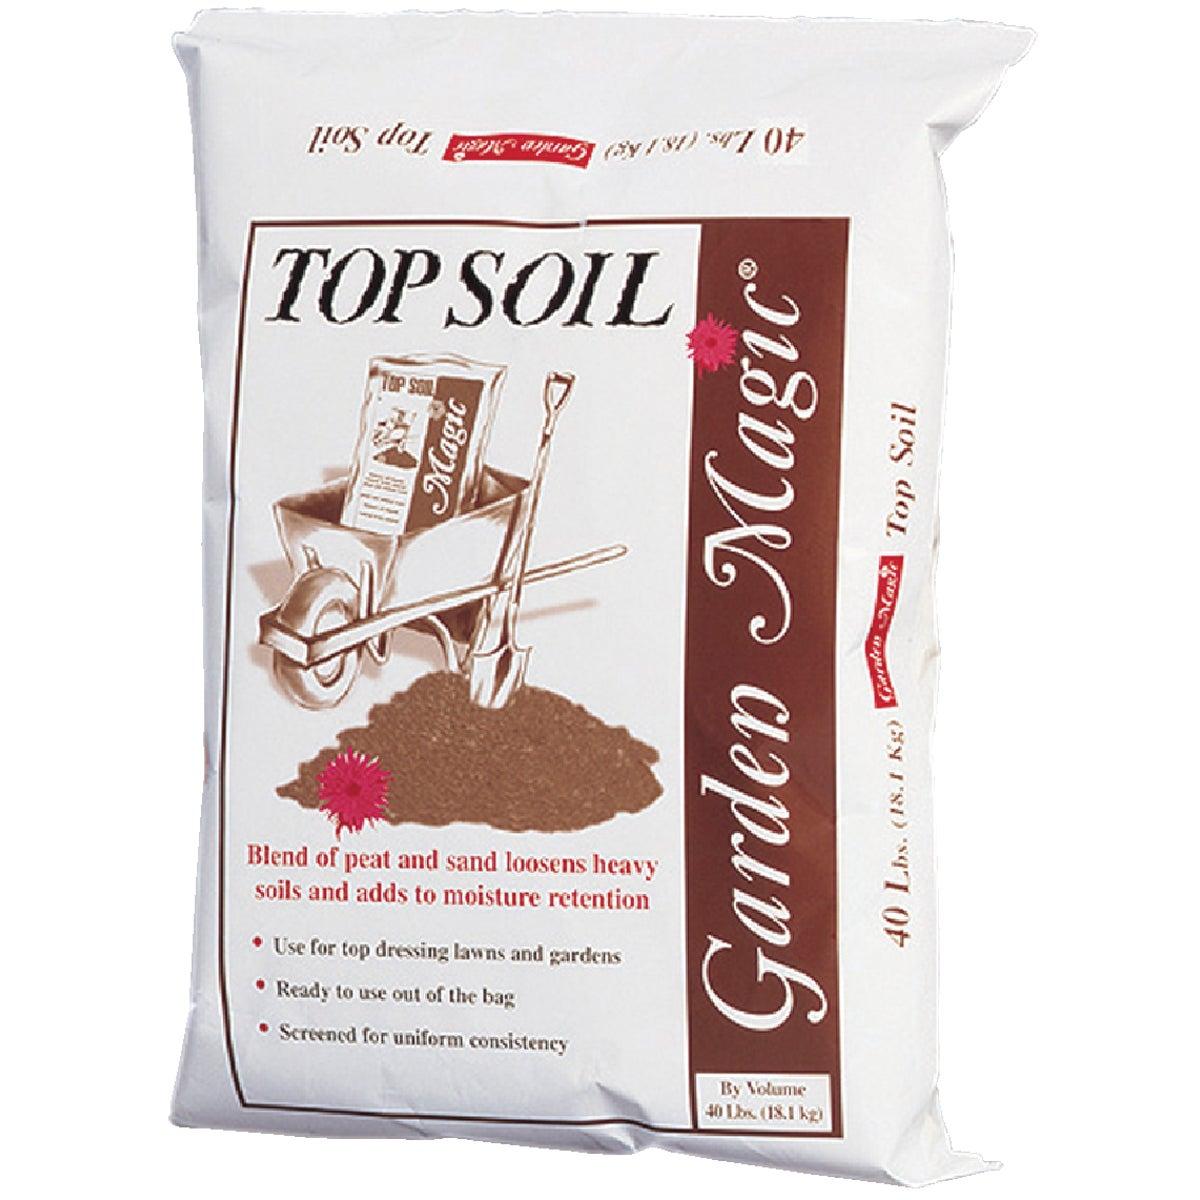 40LB TOP SOIL - 5540 by Michigan Peat